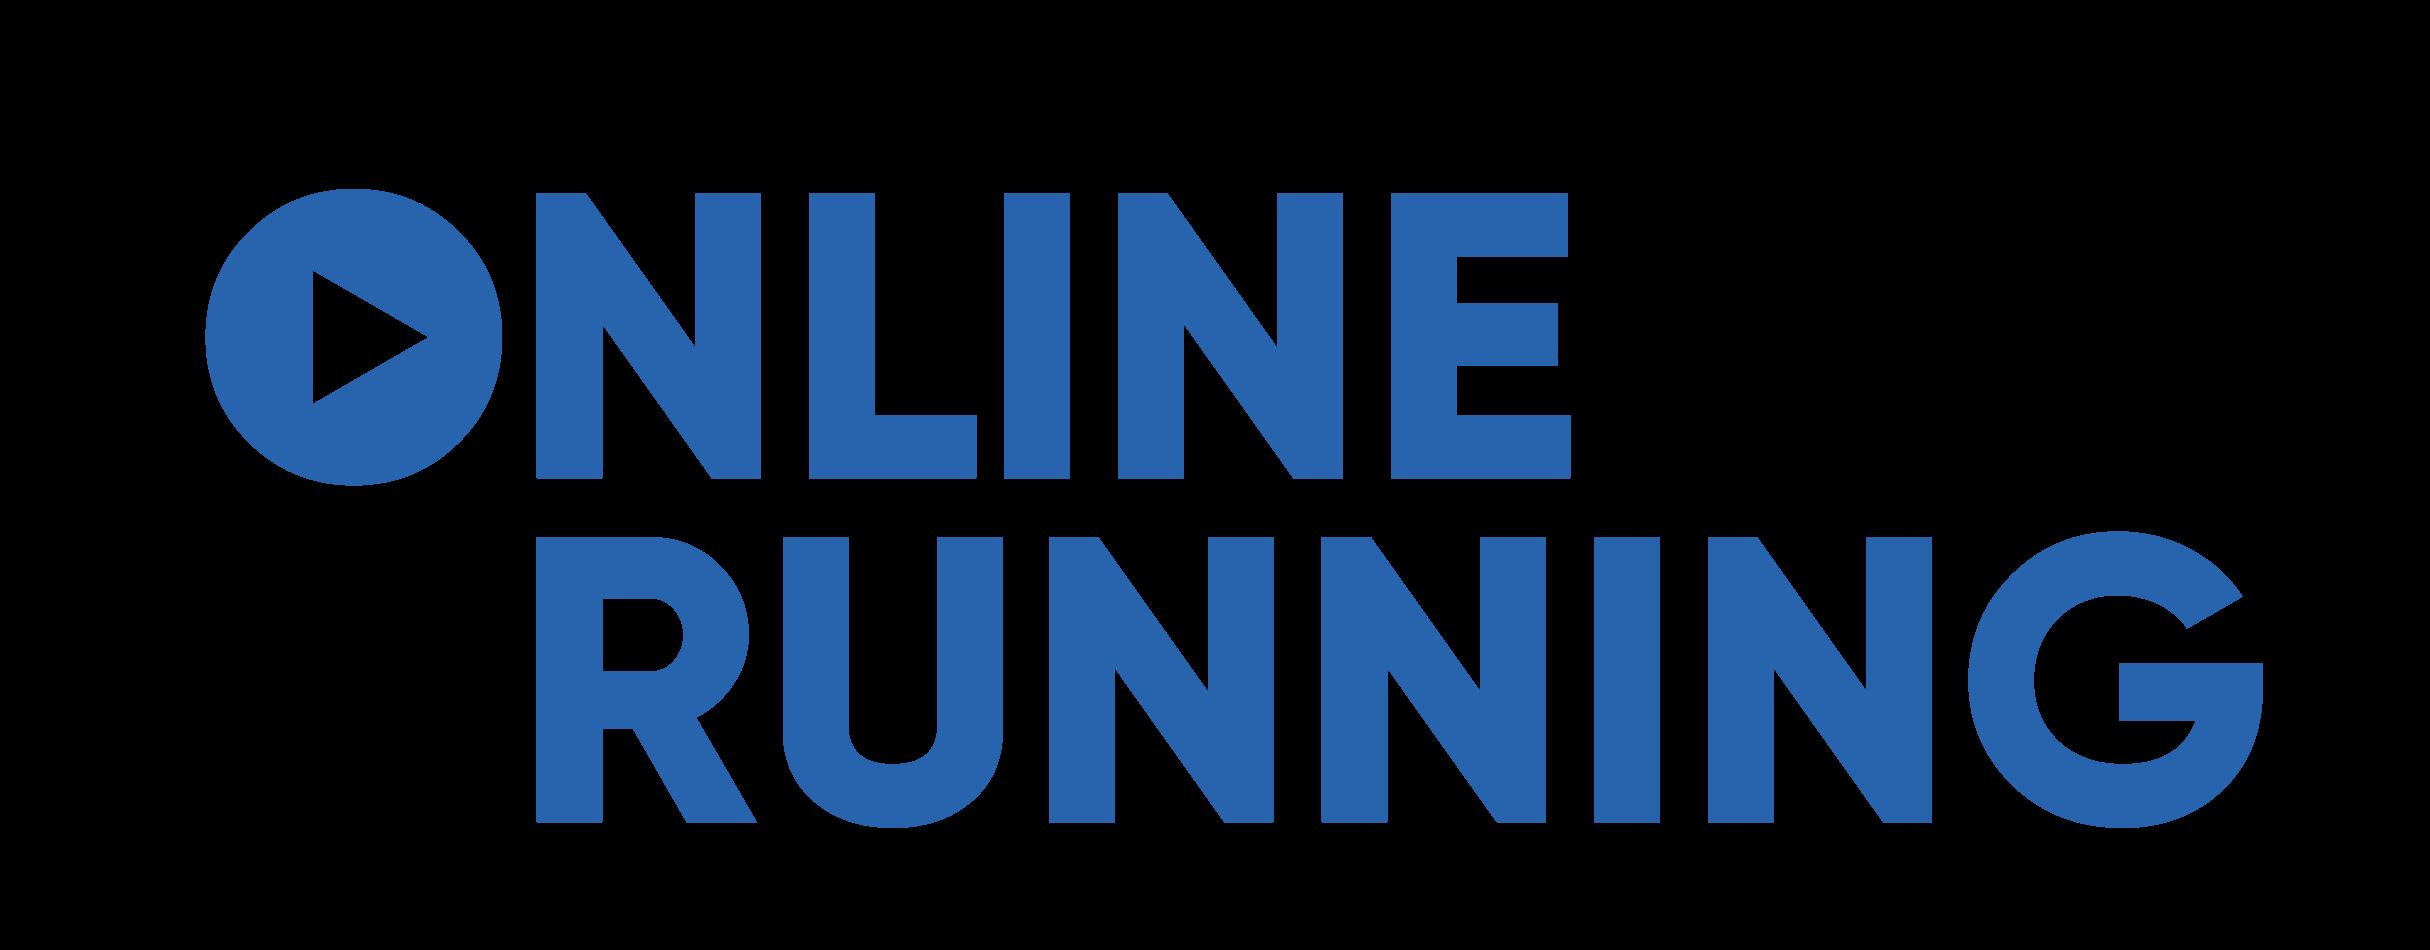 ONLINE RUNNING